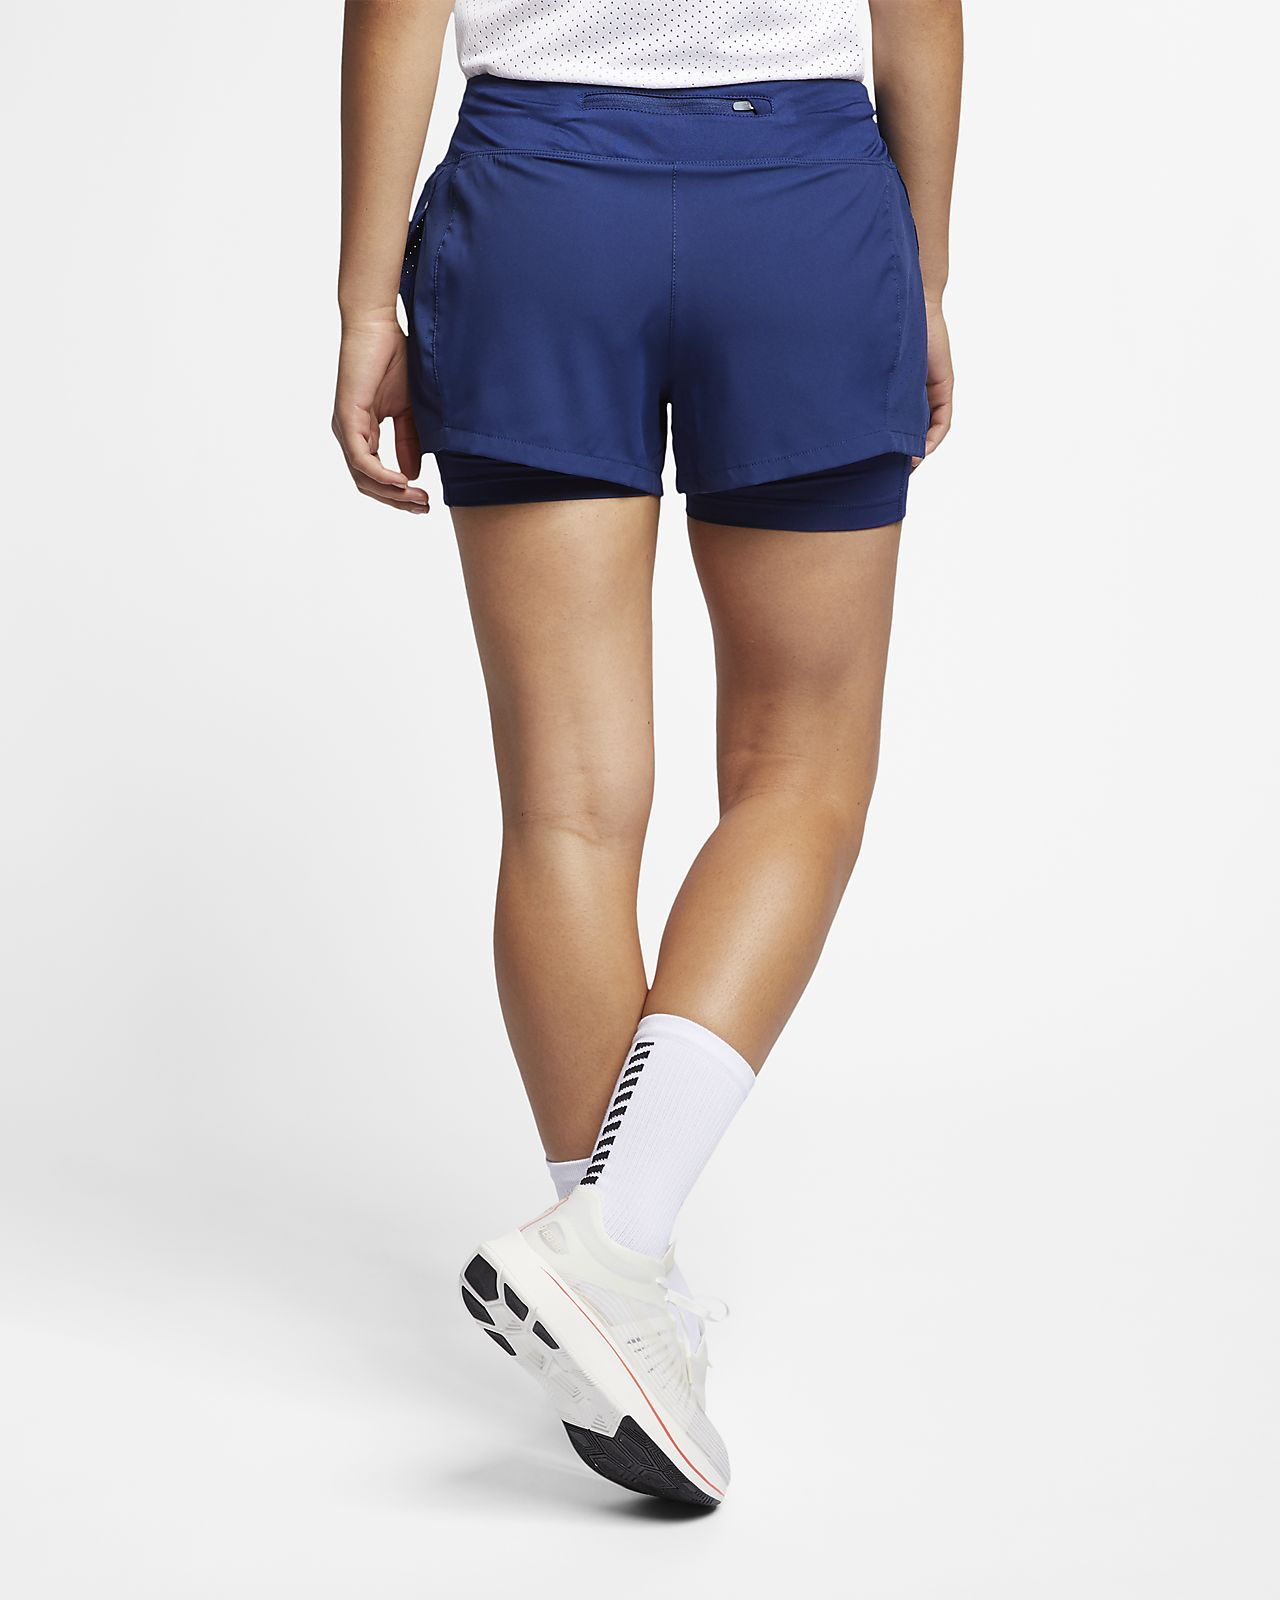 check-out 41808 cd8c8 Shorts de running 2 en 1 para mujer Nike Eclipse